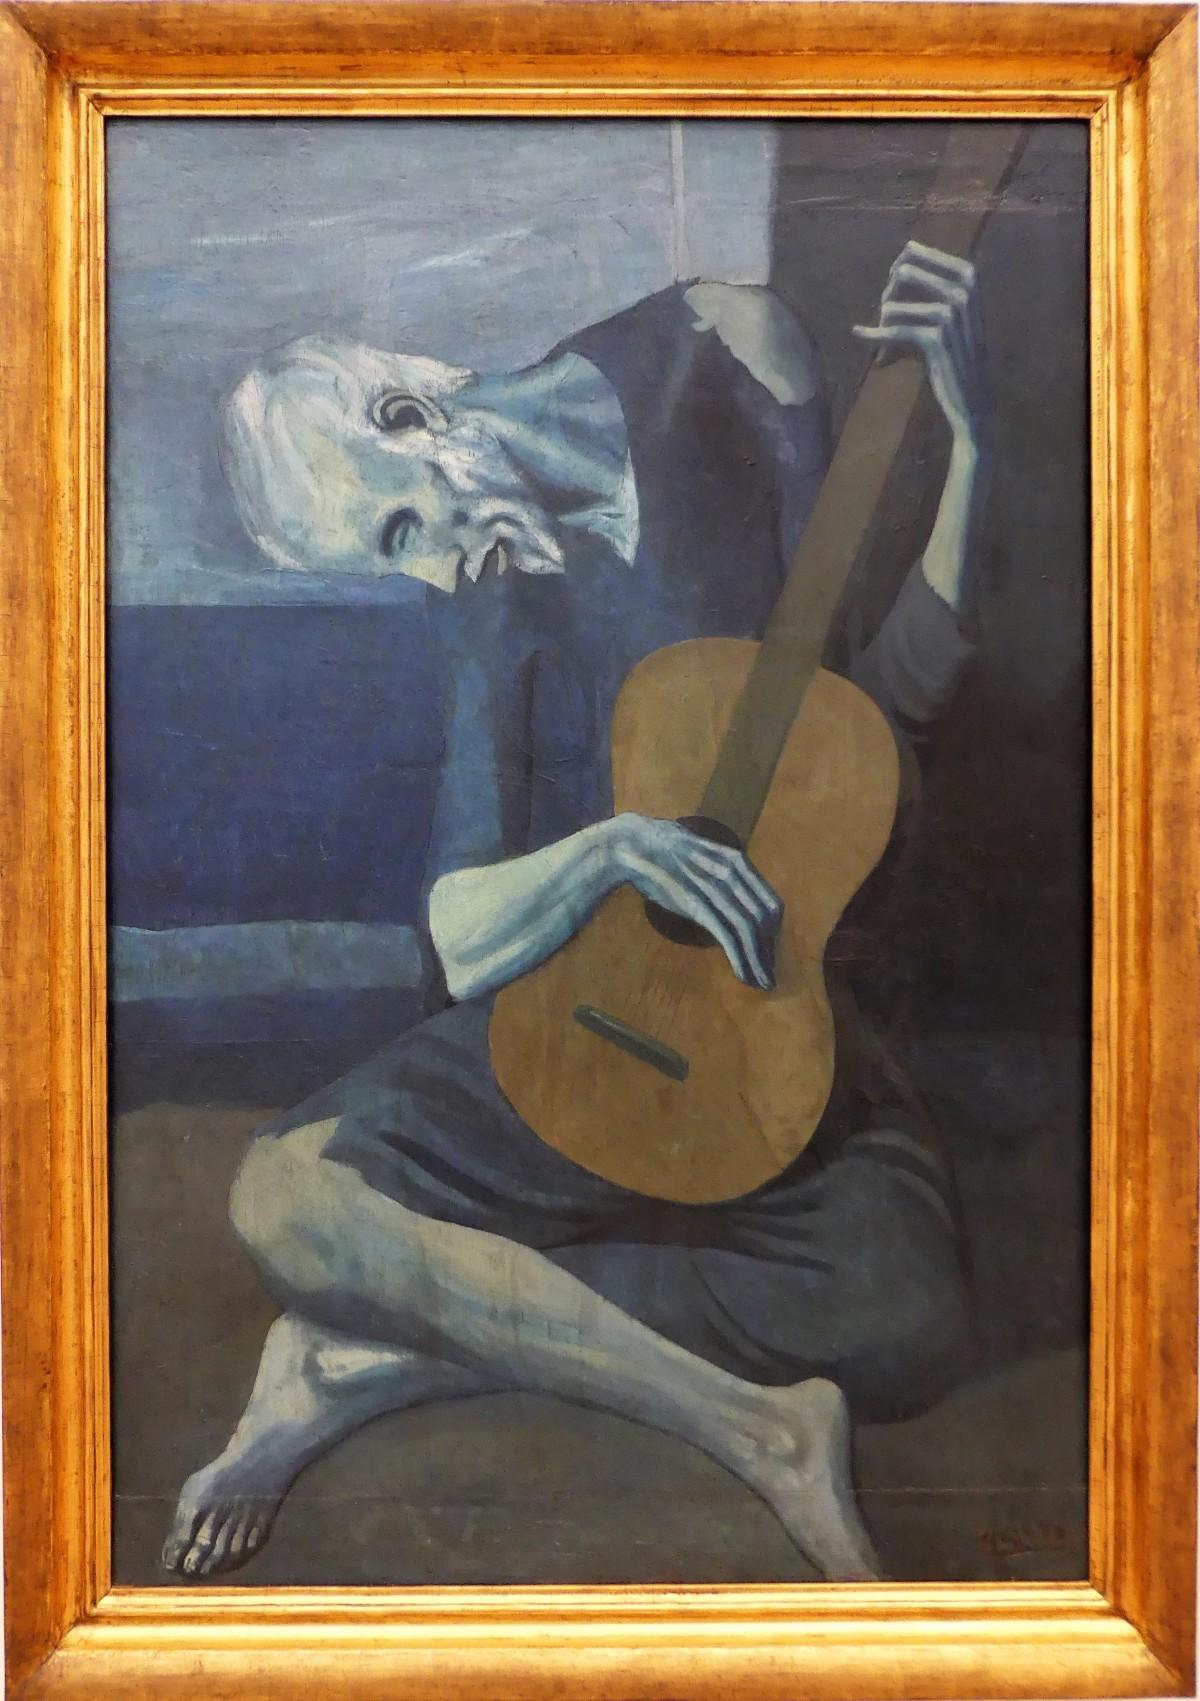 Pablo Picassa's The Old Gitarist